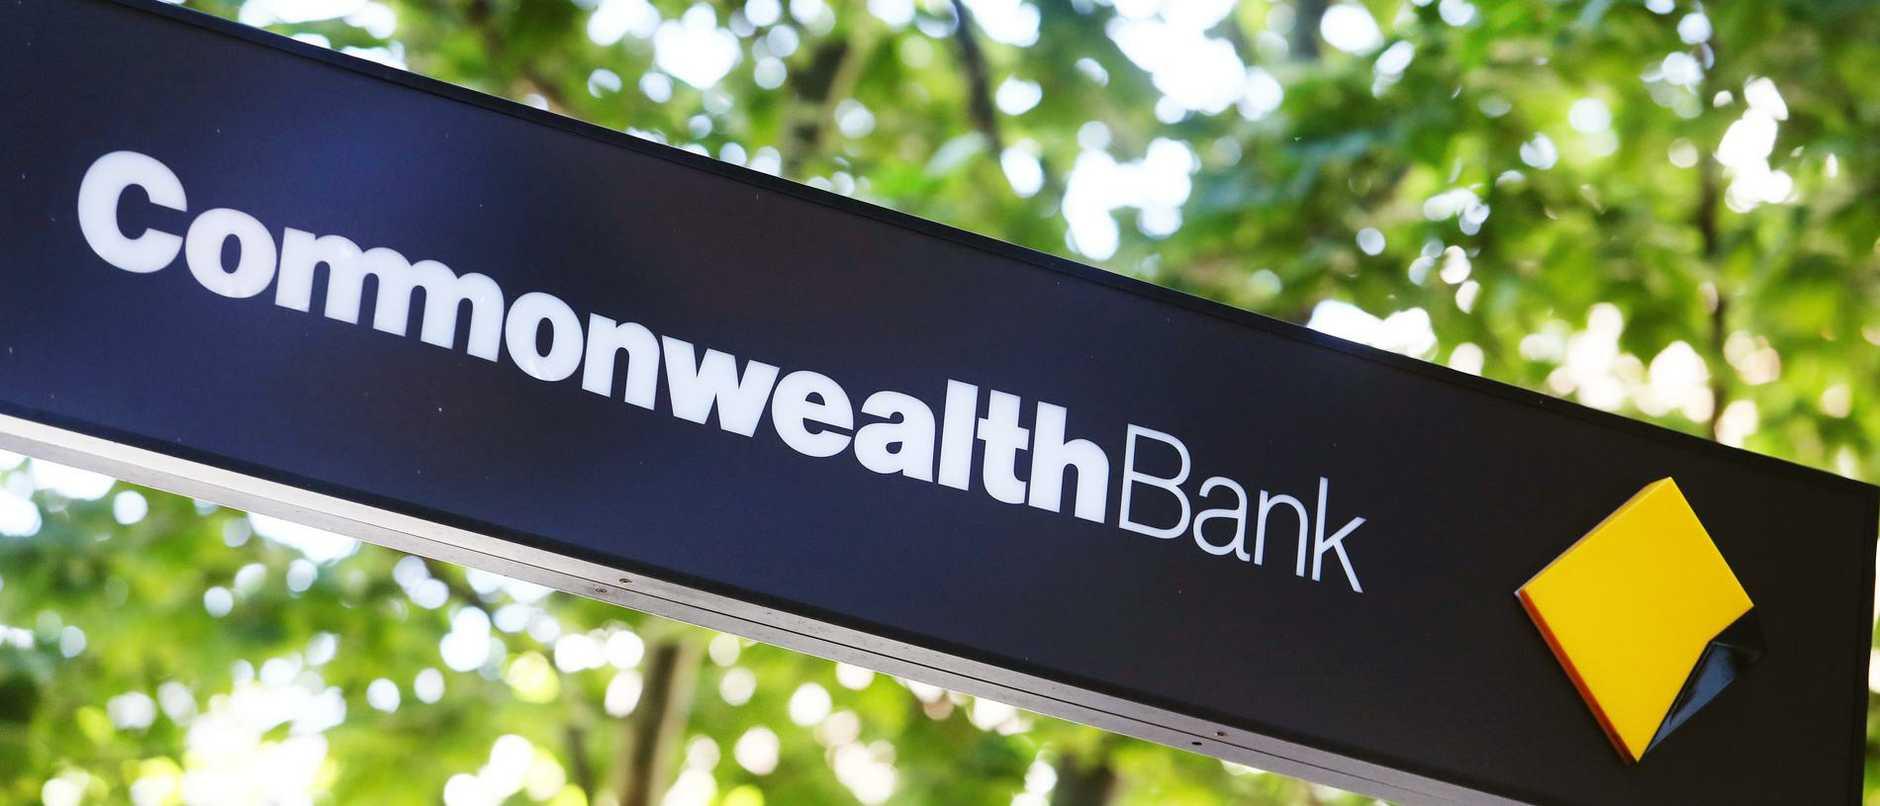 Commonwealth Bank generics